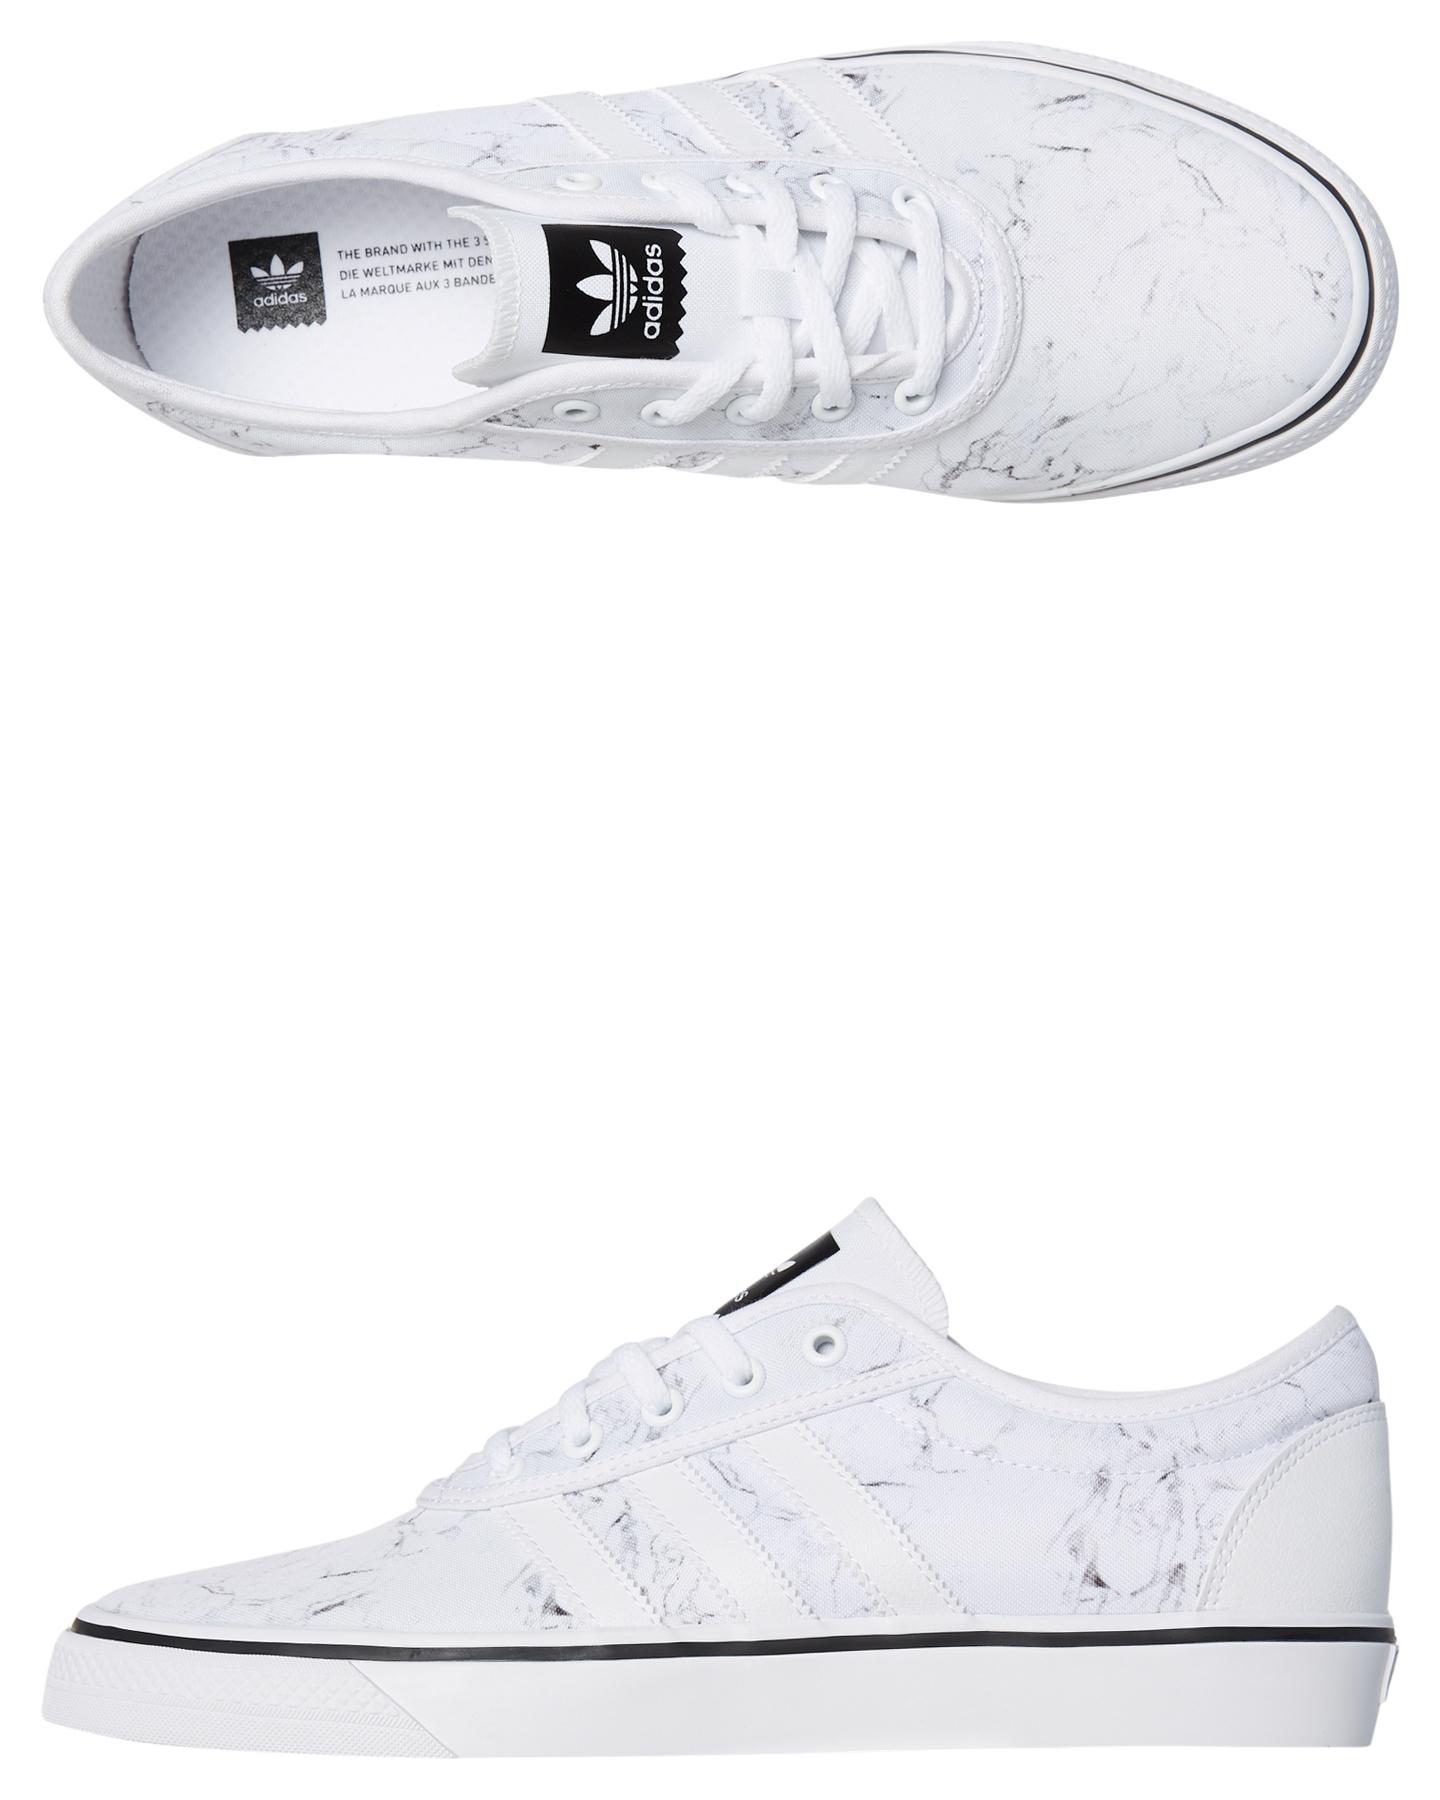 adidas adi Ease Shoes Black | adidas Australia